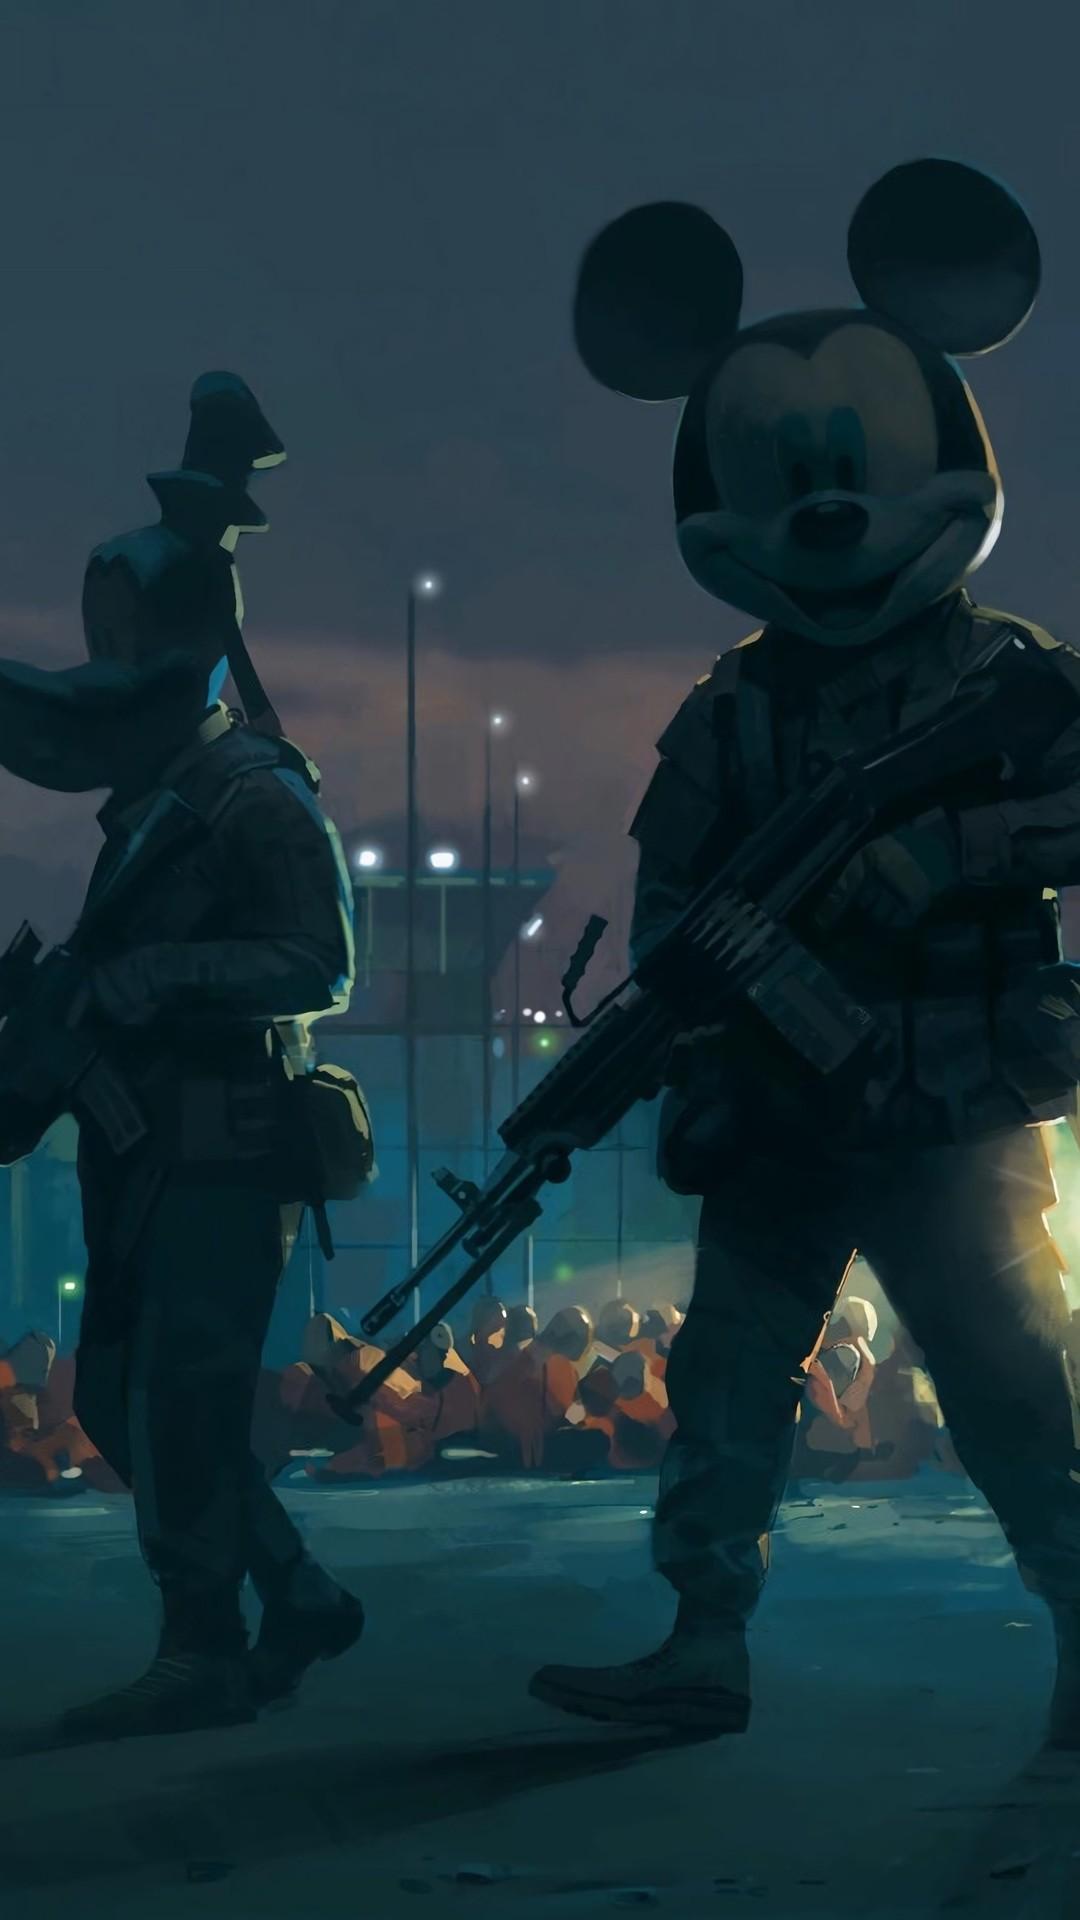 Disney Soldiers iPhone Wallpaper